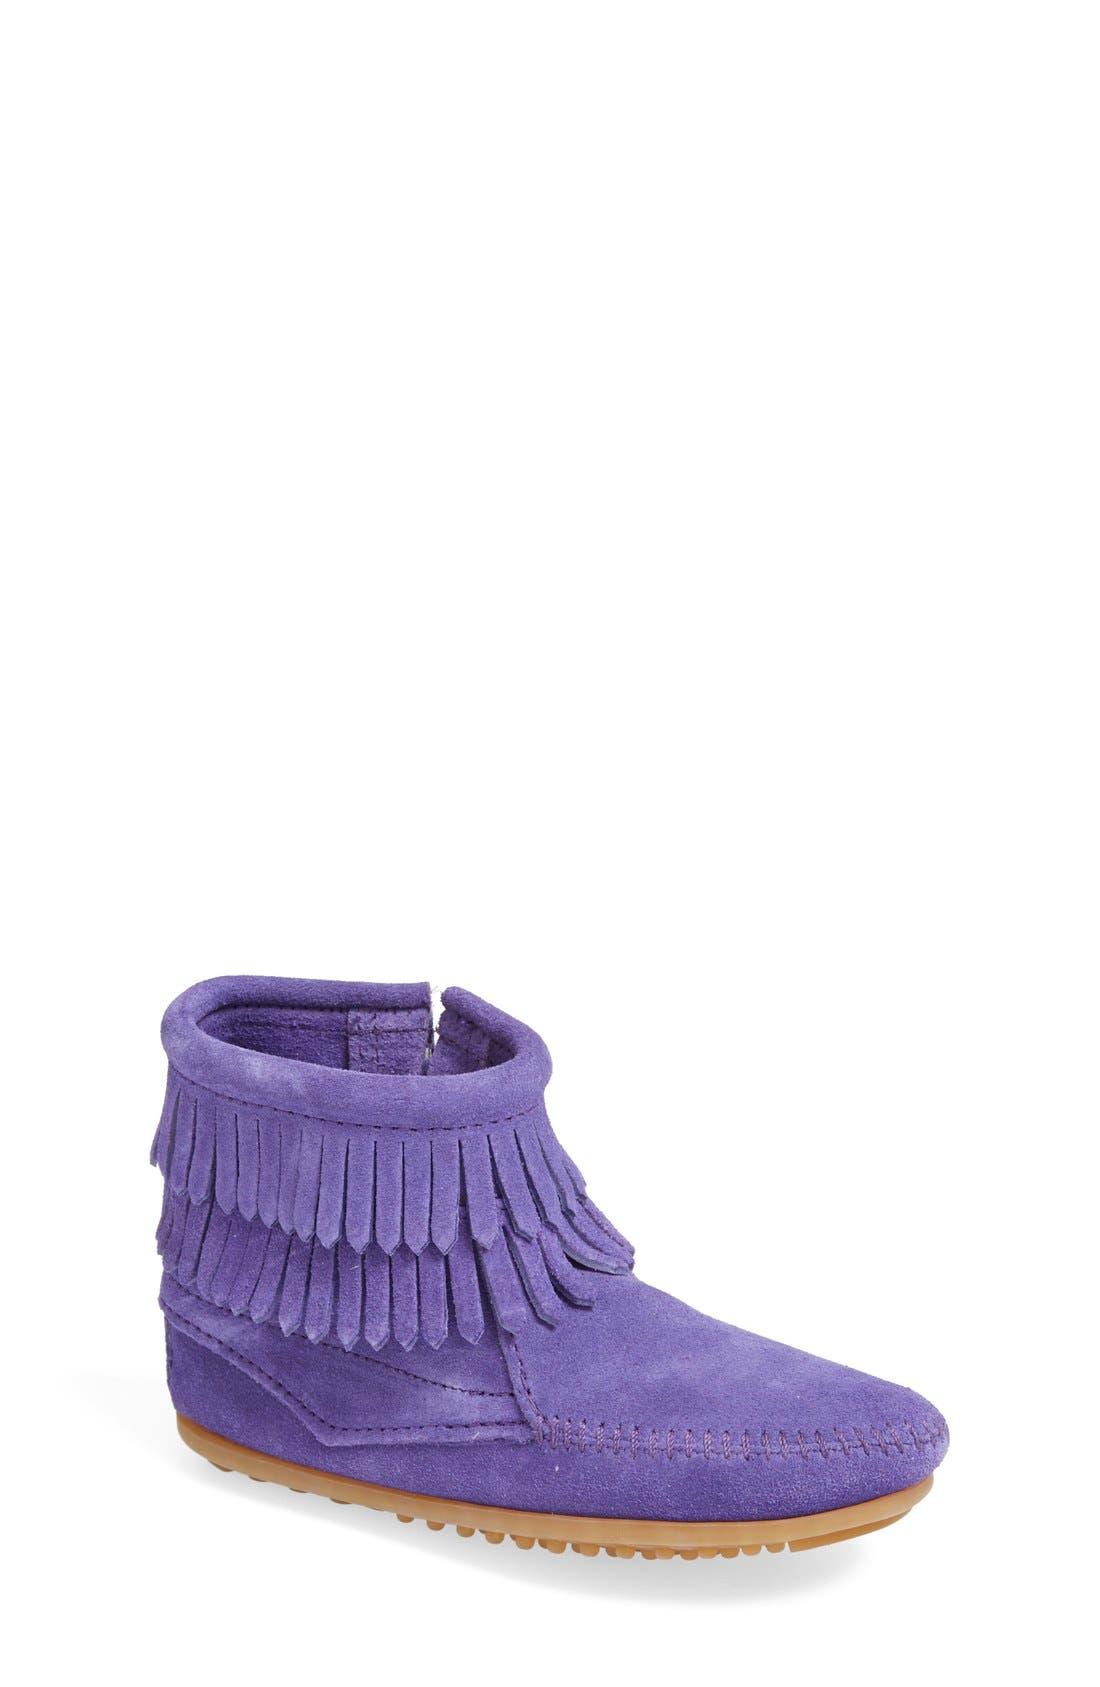 Toddler Girls Minnetonka Double Fringe Boot Size 9 M  Purple